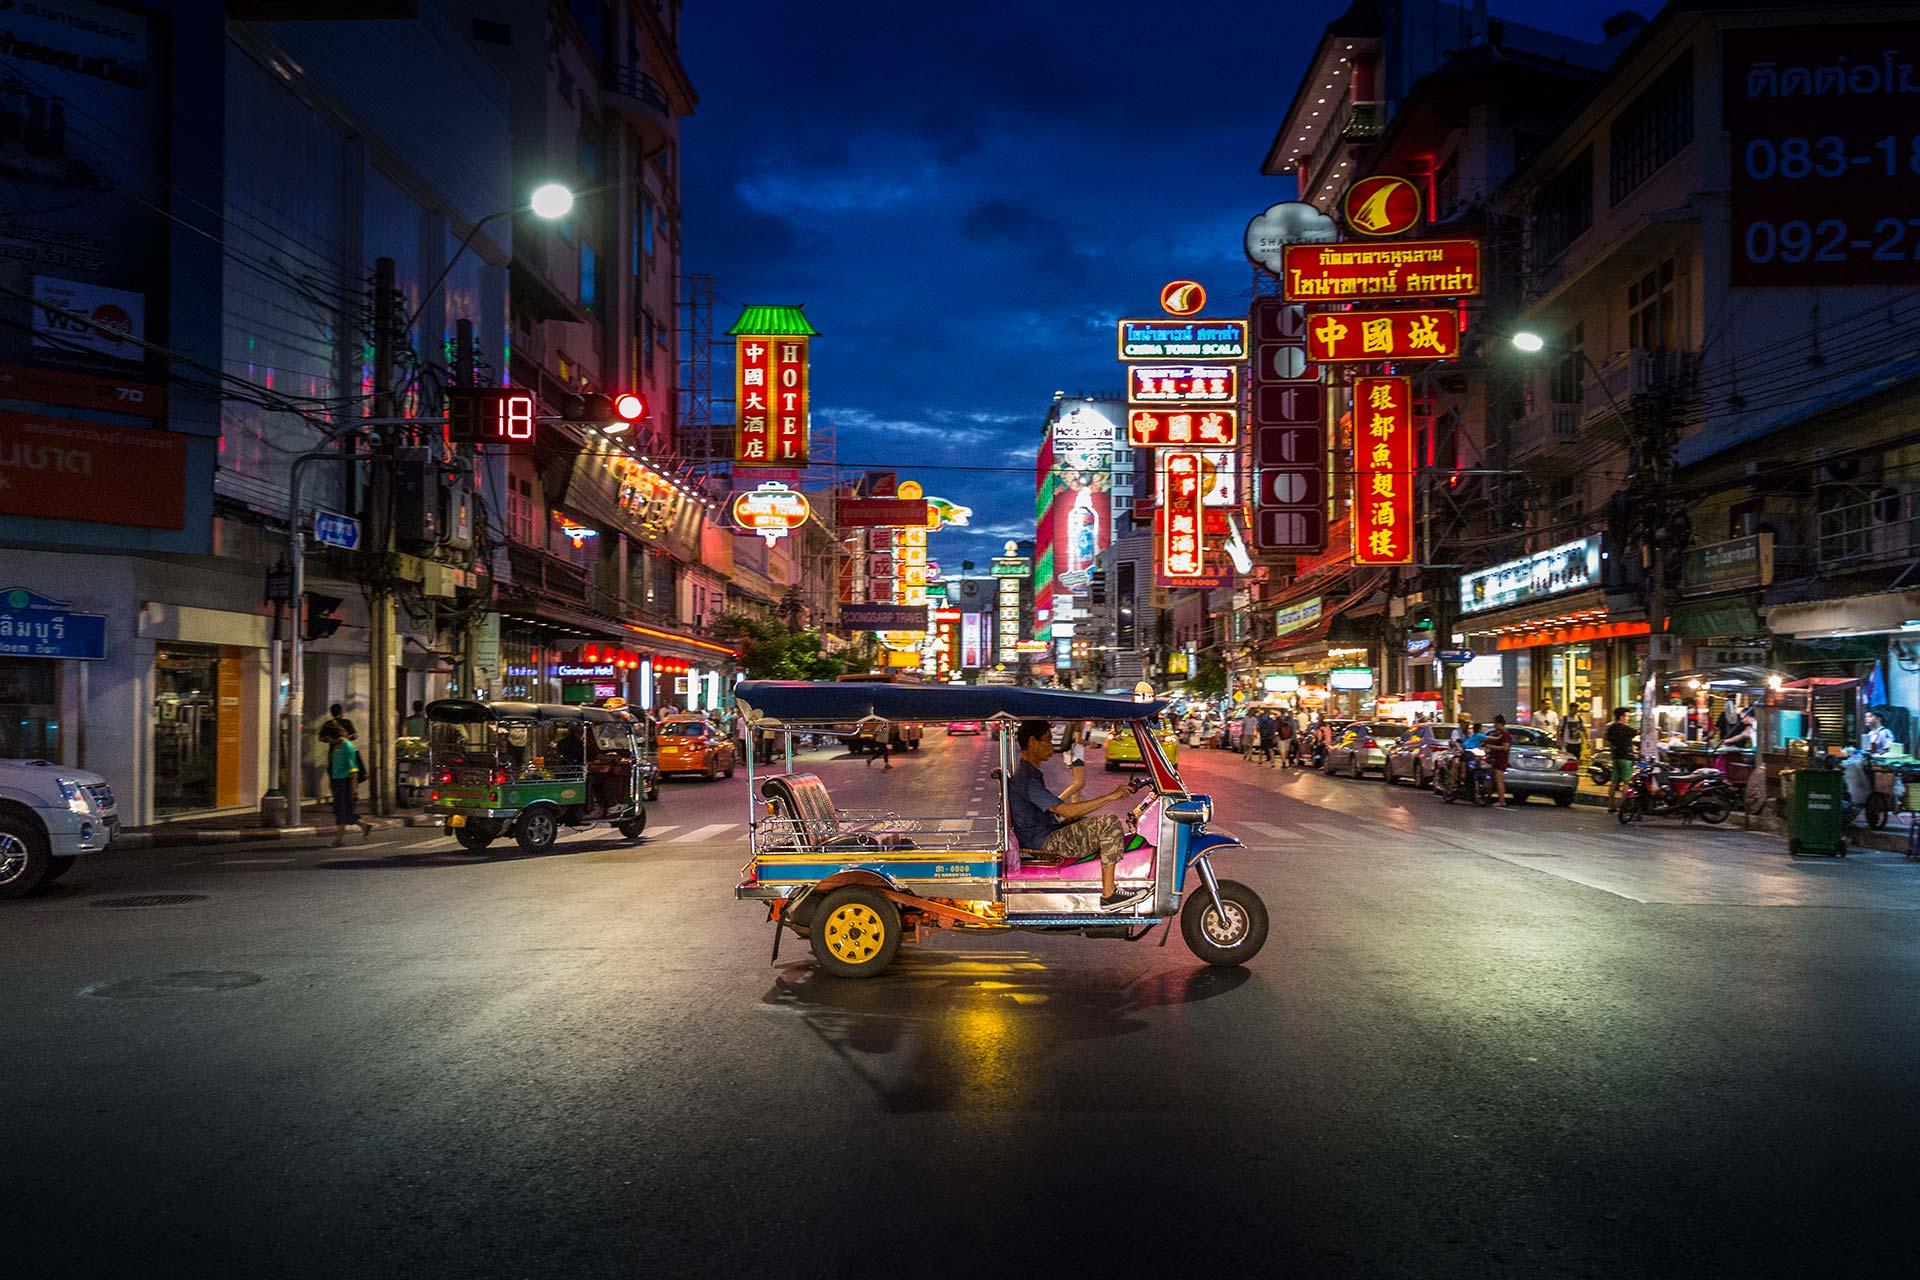 viaje-fotografico-bangkok